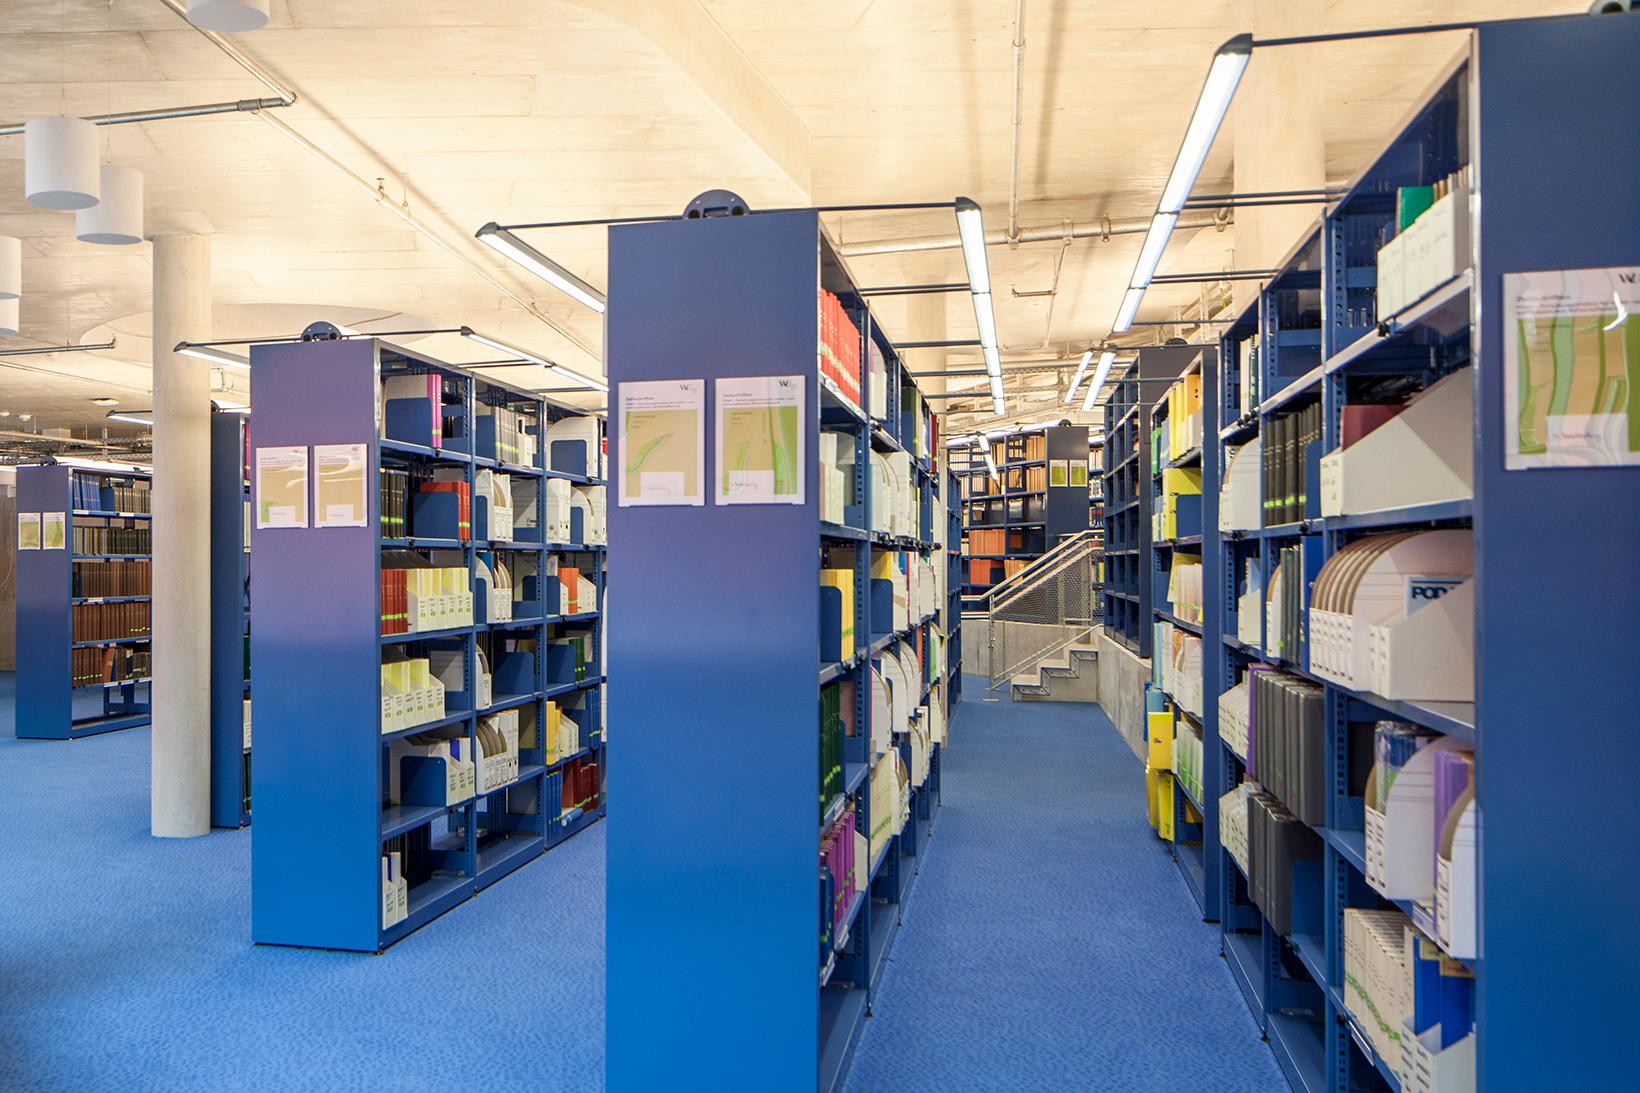 Campus WU, Bibliothek D3 (c) BOAnet